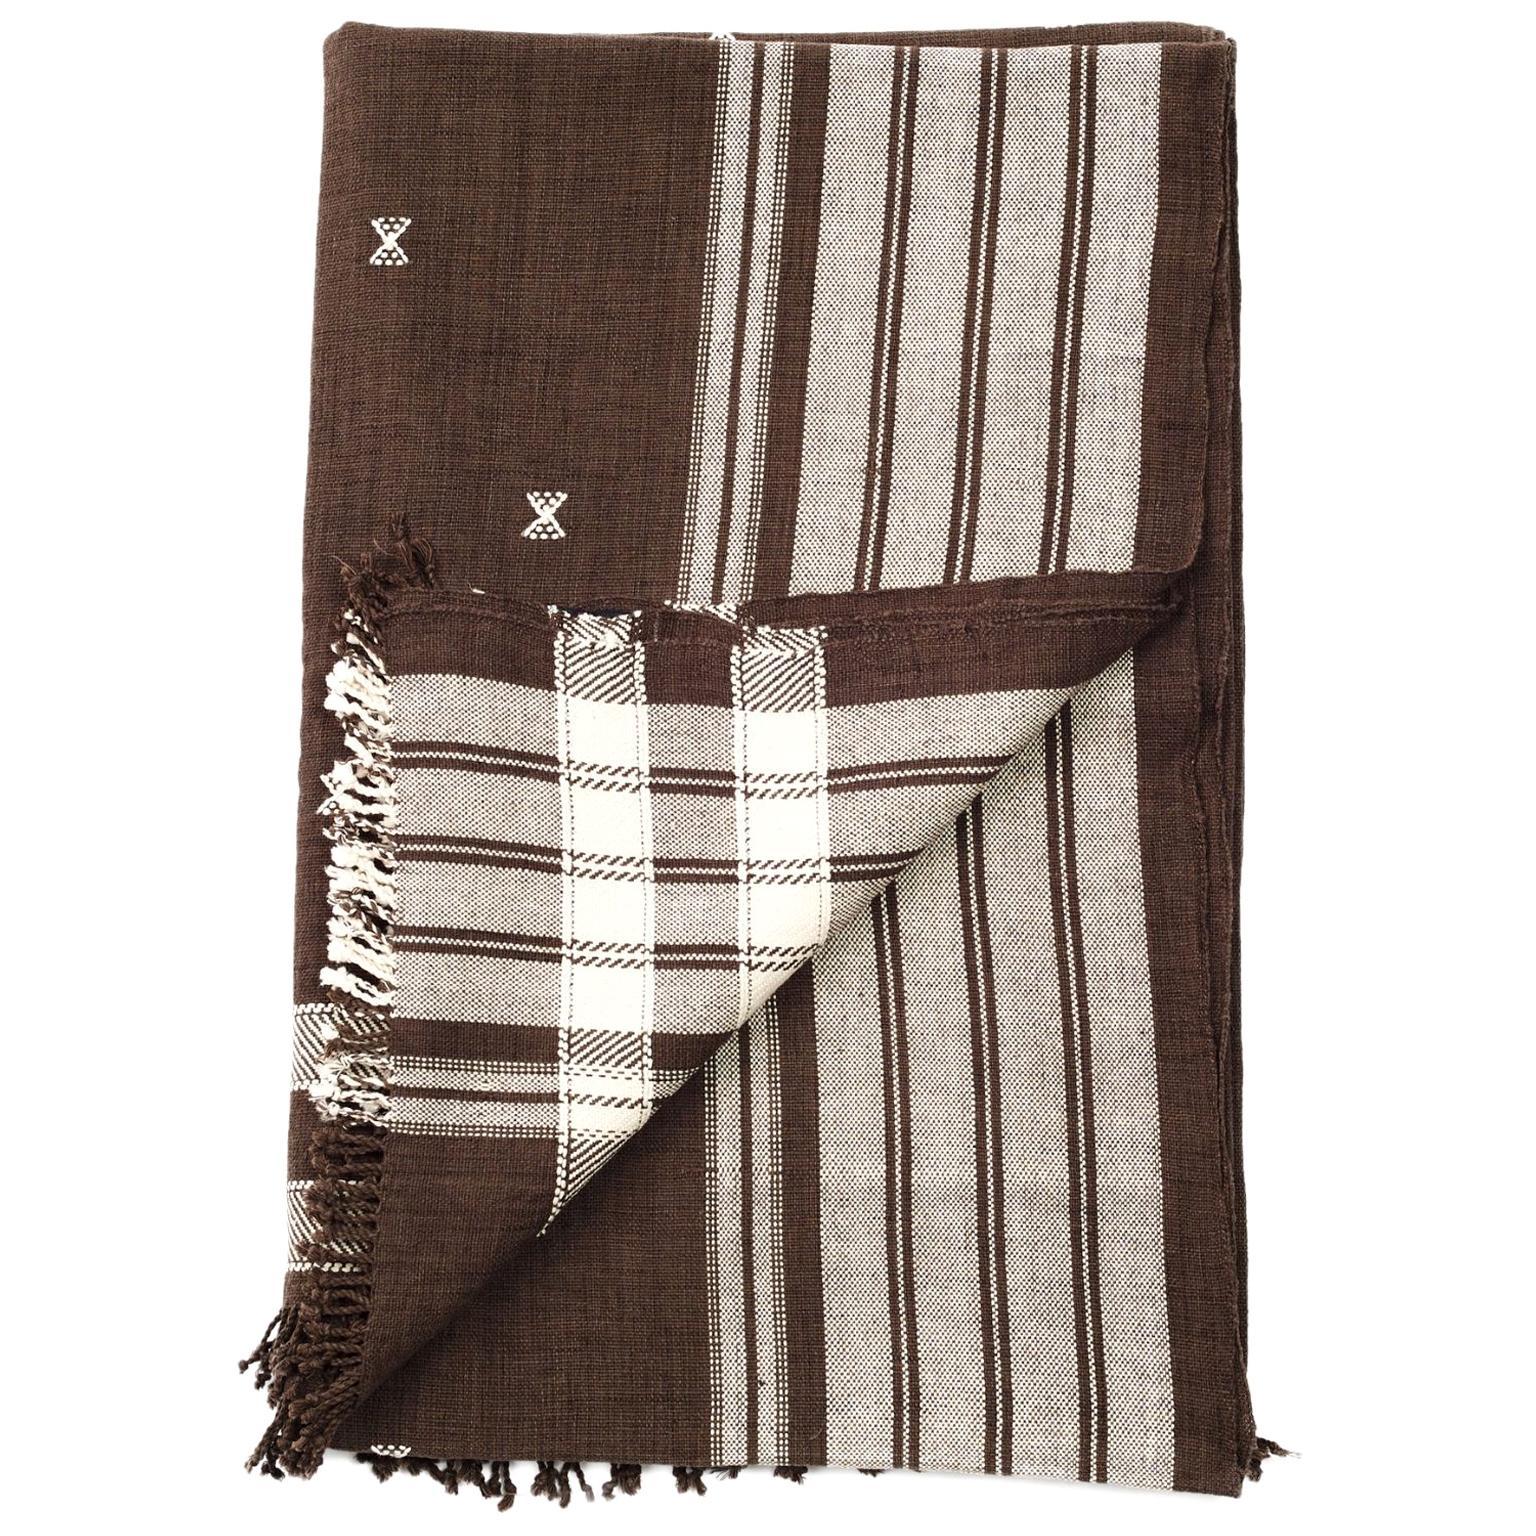 Ebony Throw / Blanket / Bedspread, Brown and Indigo, in Organic Cotton